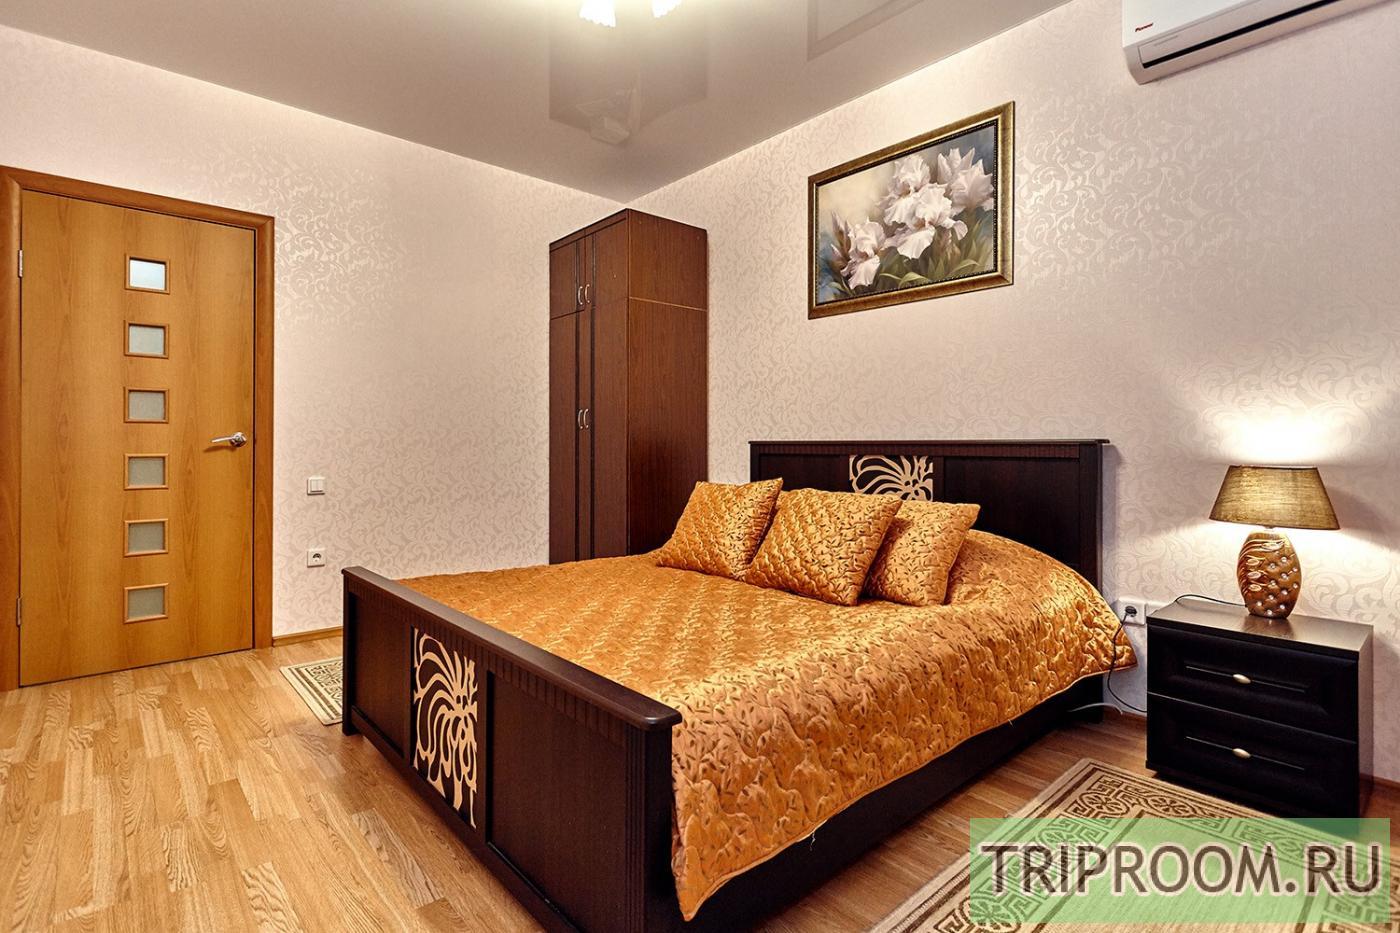 2-комнатная квартира посуточно (вариант № 10581), ул. Соколова улица, фото № 3